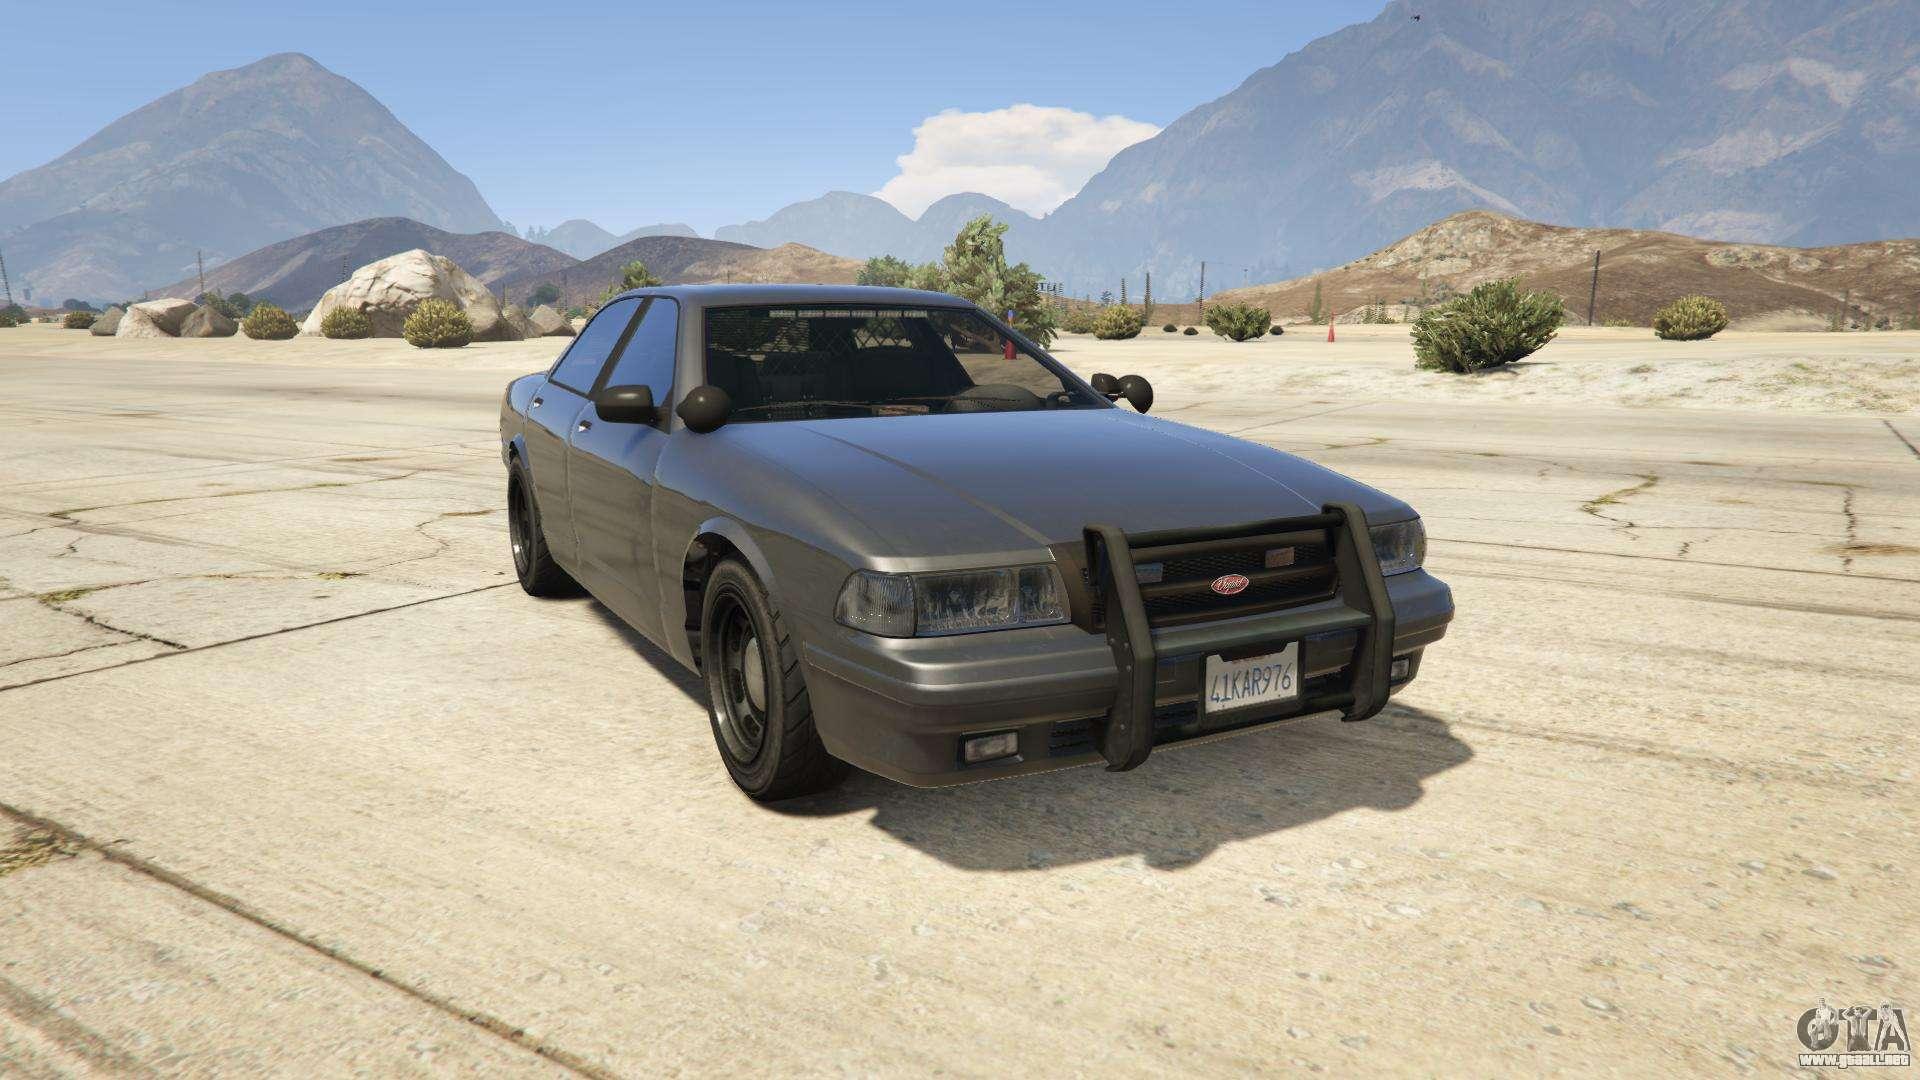 GTA 5 Vapid Unmarked Cruiser - vista frontal